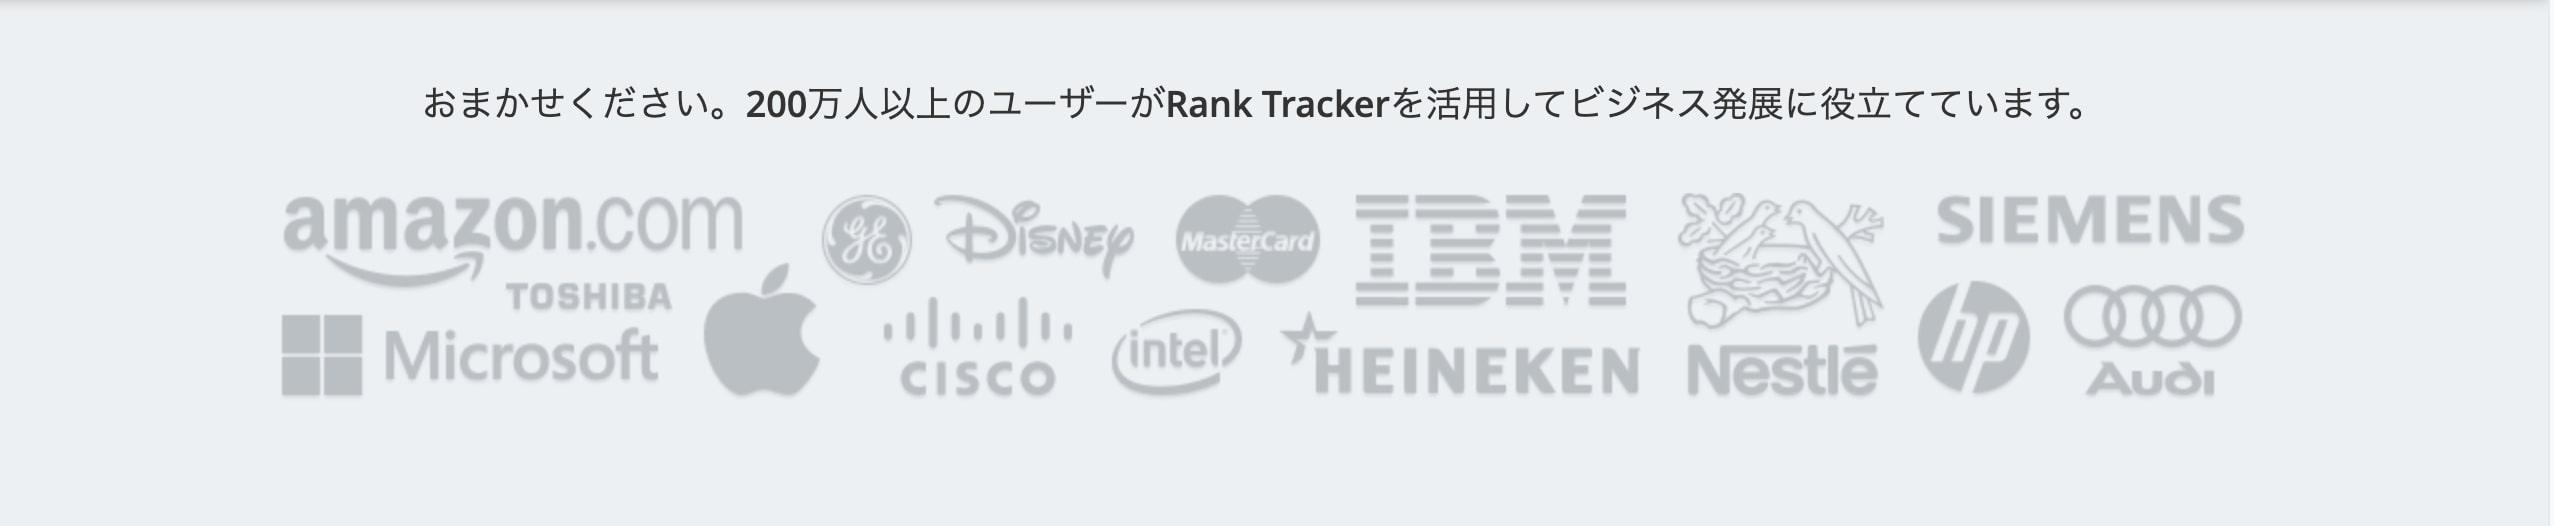 Rank Trackerの運営会社情報